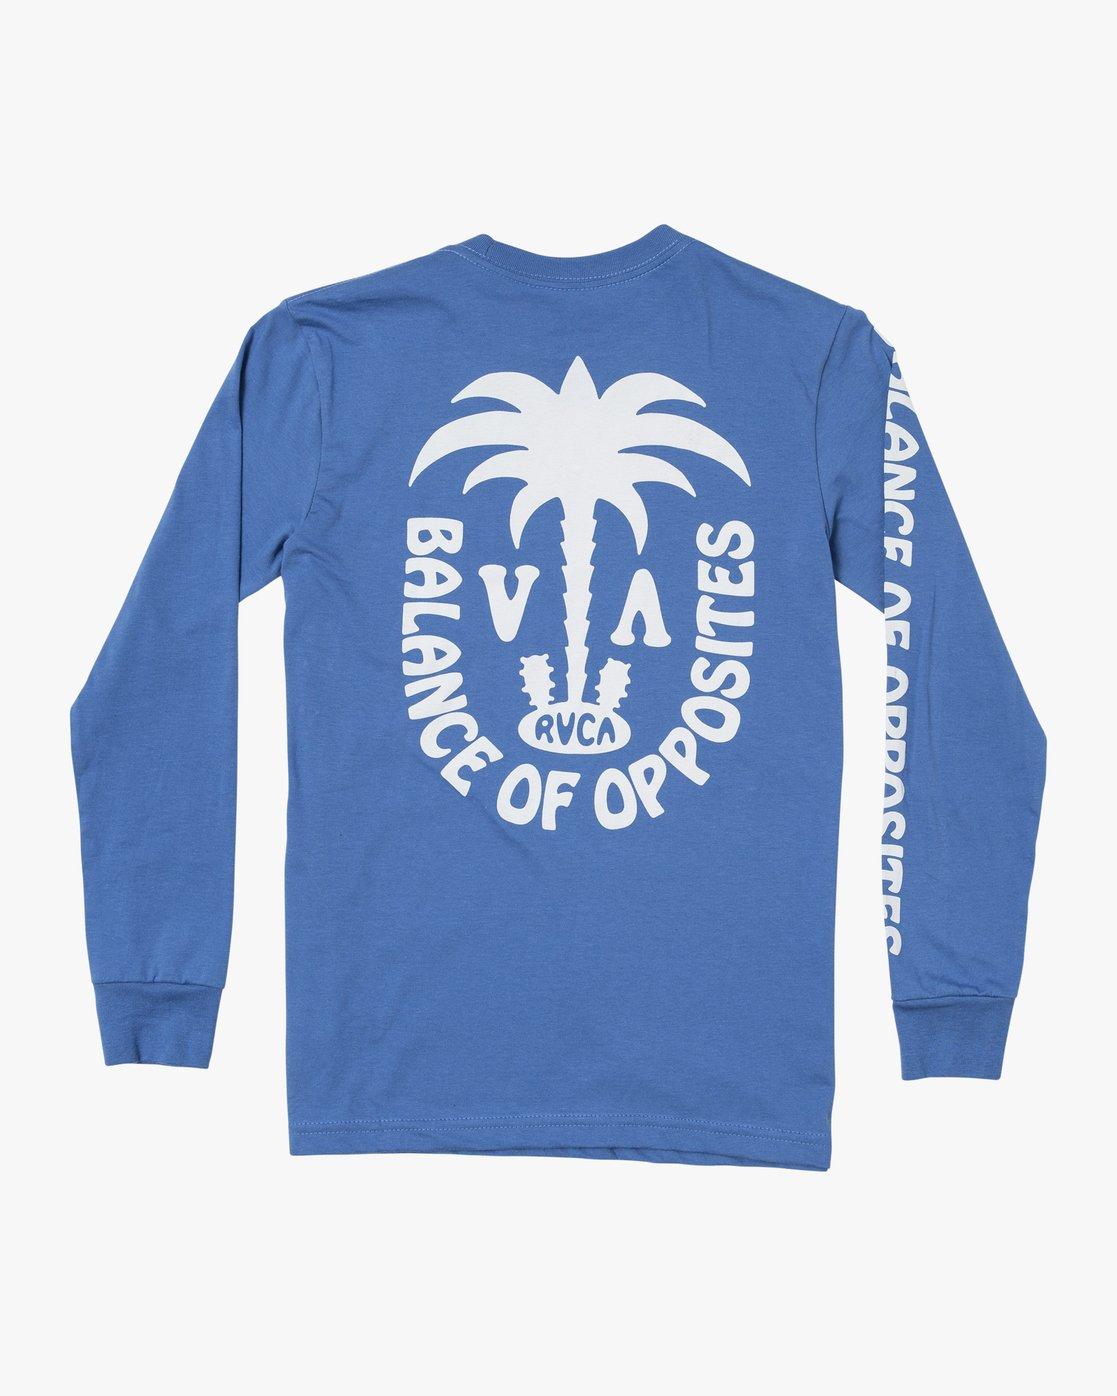 1 BOYS OASIS LONG SLEEVE T-SHIRT Blue B4512ROA RVCA